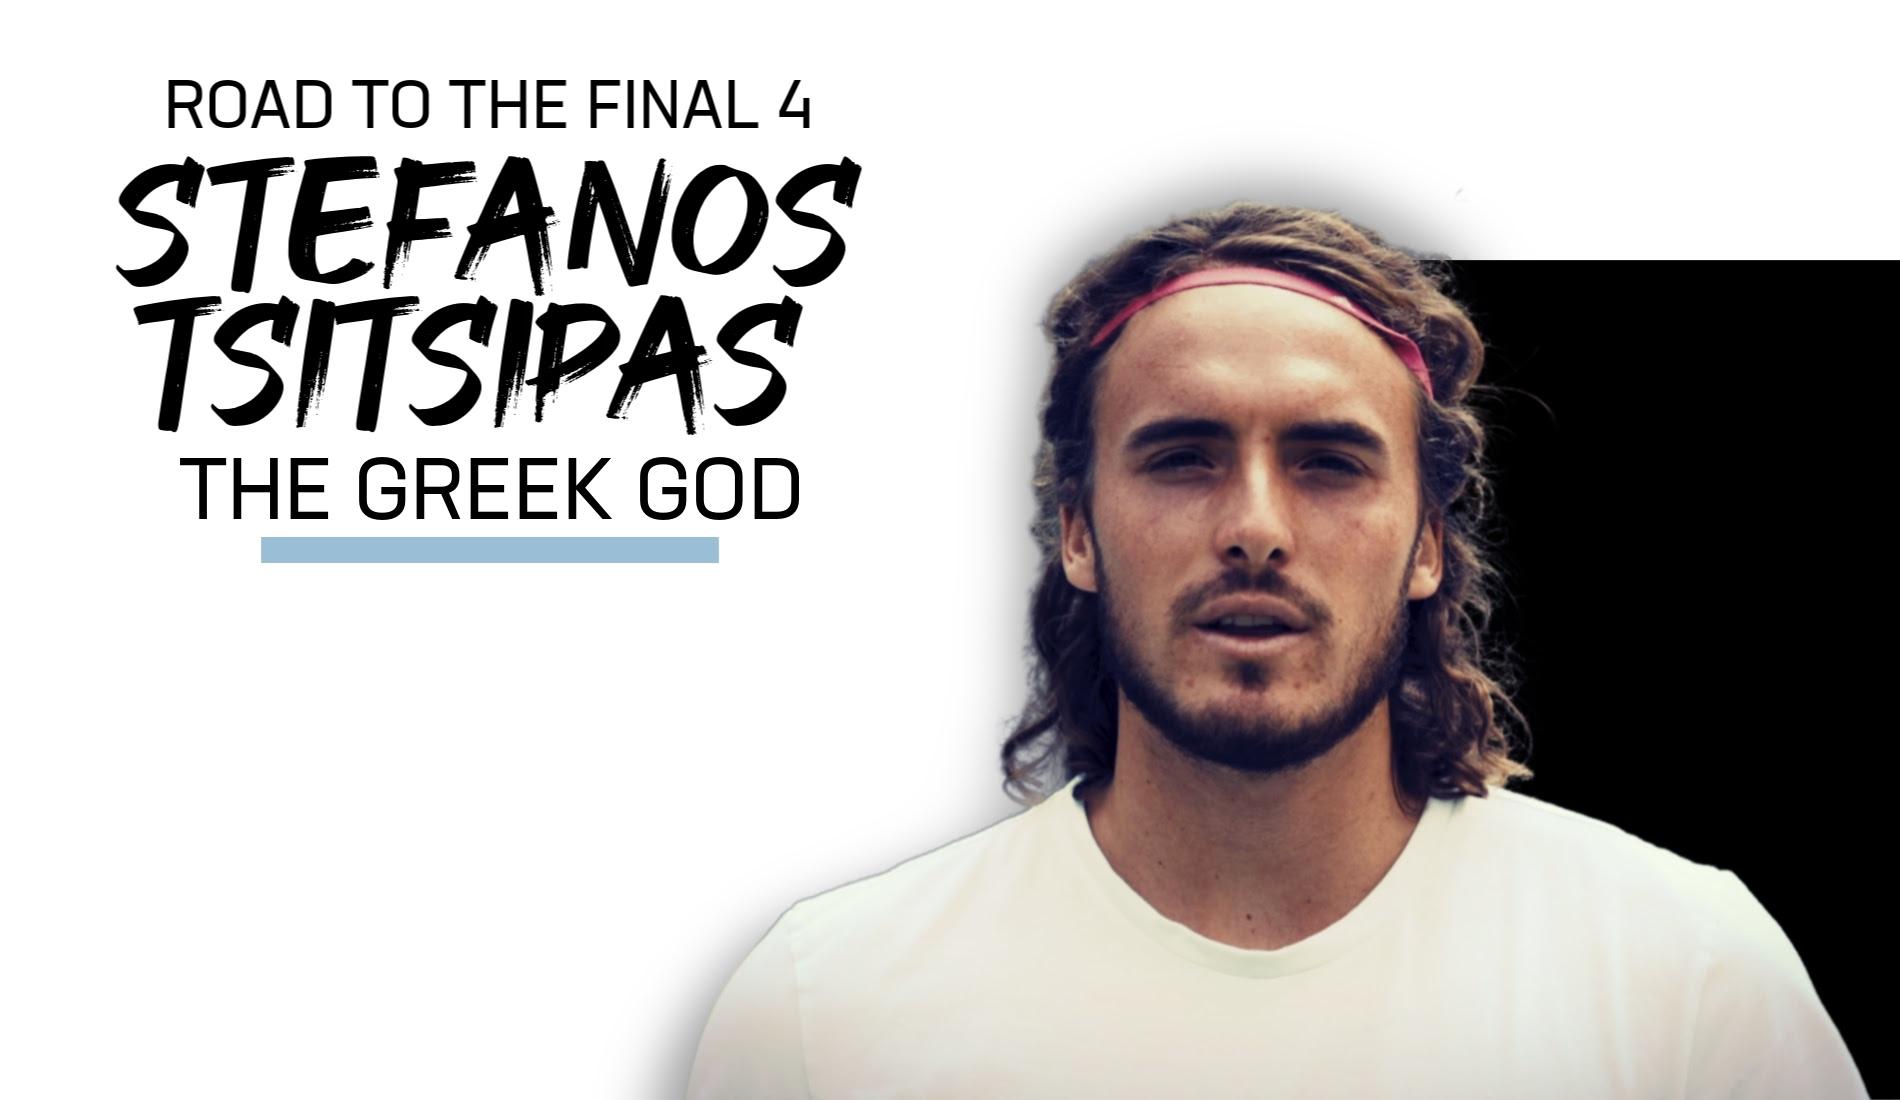 UTS - Road to the Final 4: Stefanos Tsitsipas